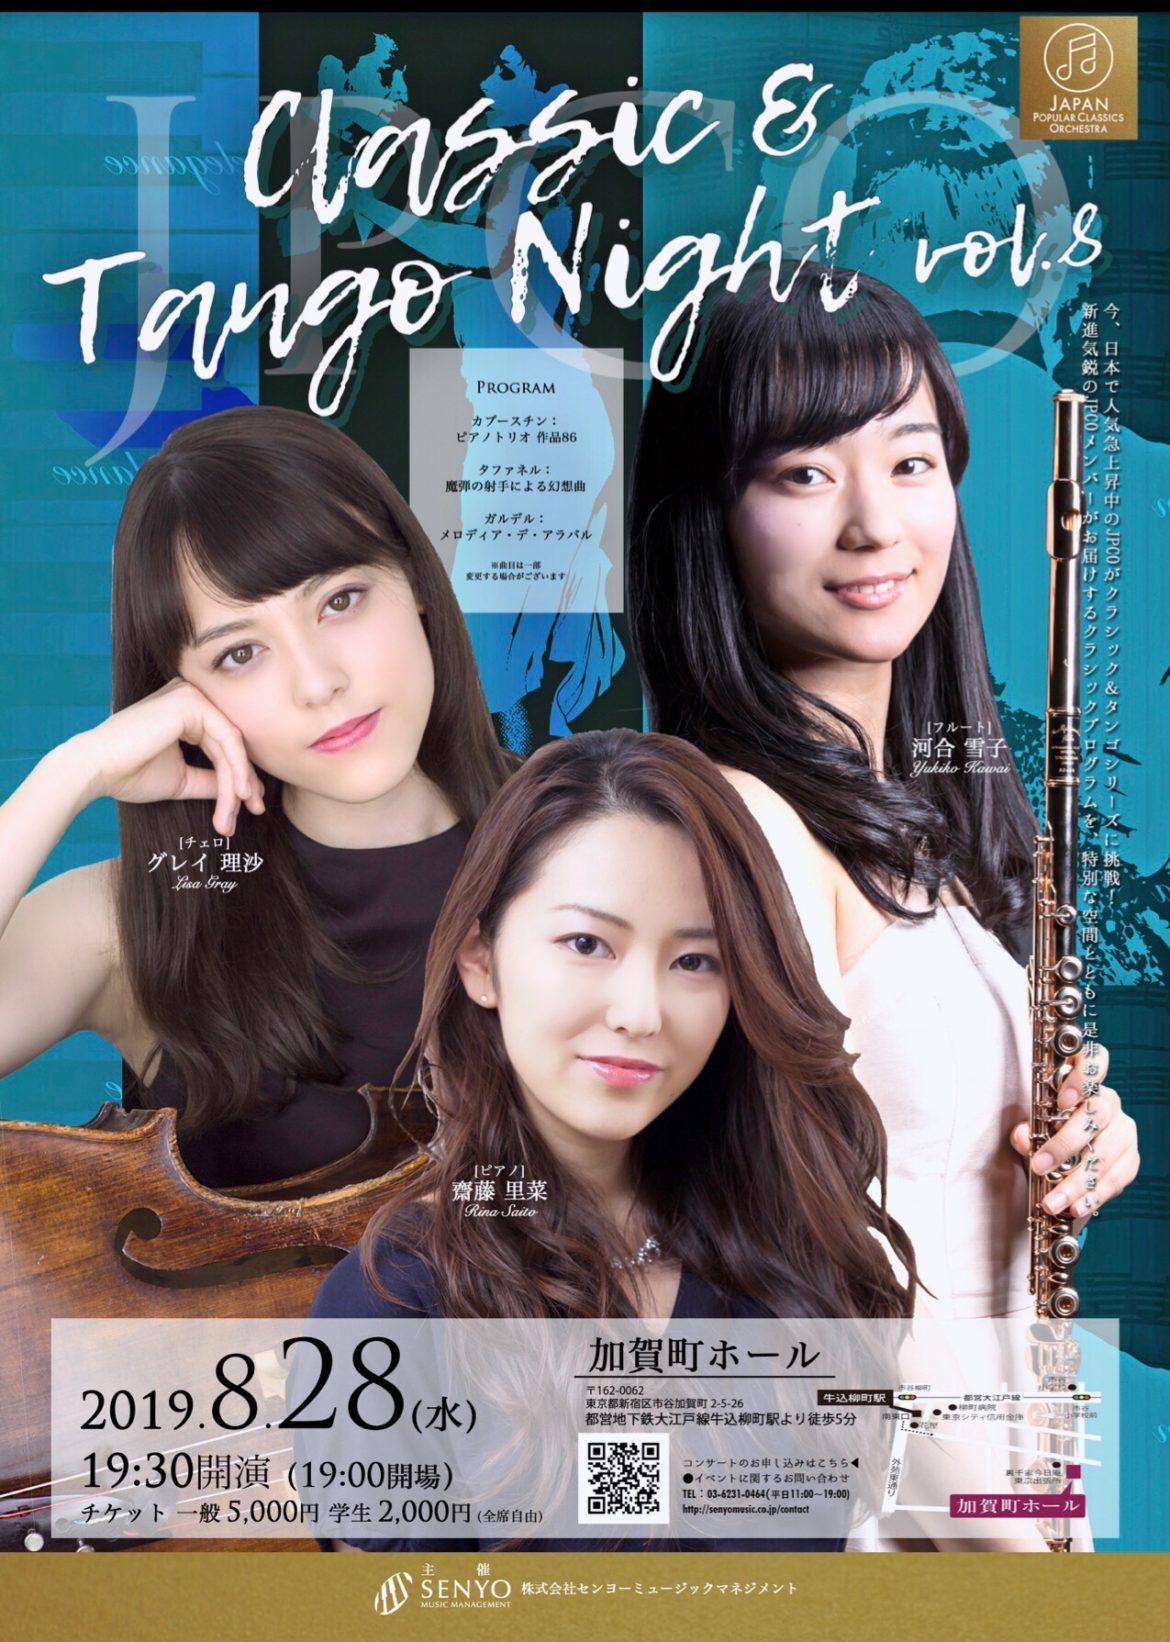 2019.8.28  JPCO CLASSIC & TANGO NIGHT  vol.8